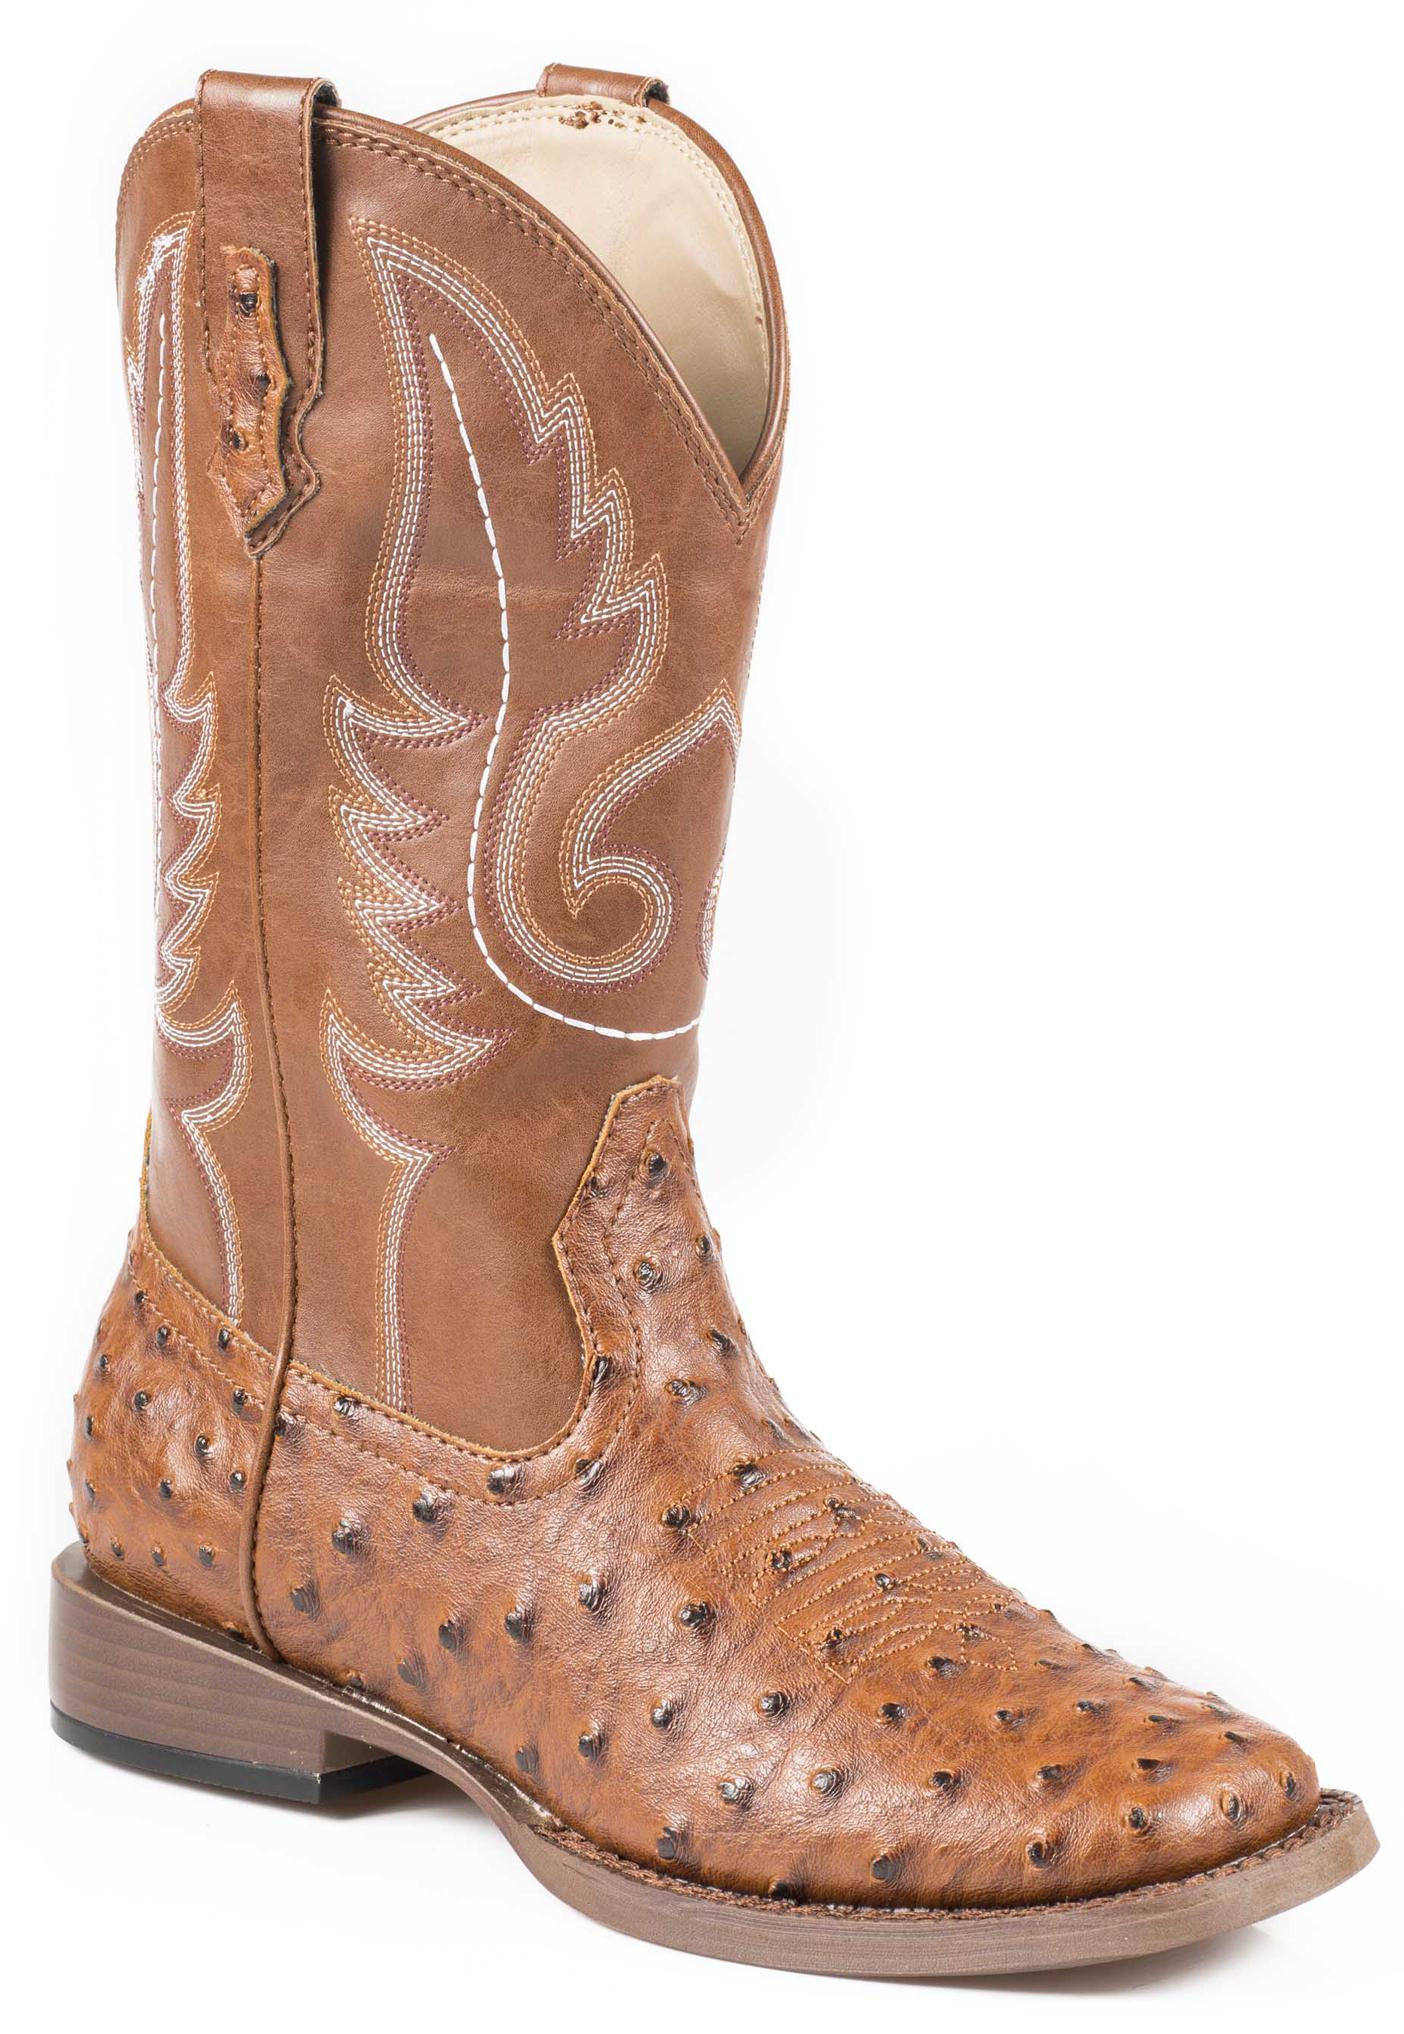 Roper Faux Ostrich Cowboy Boots  Square Toe Tan hires